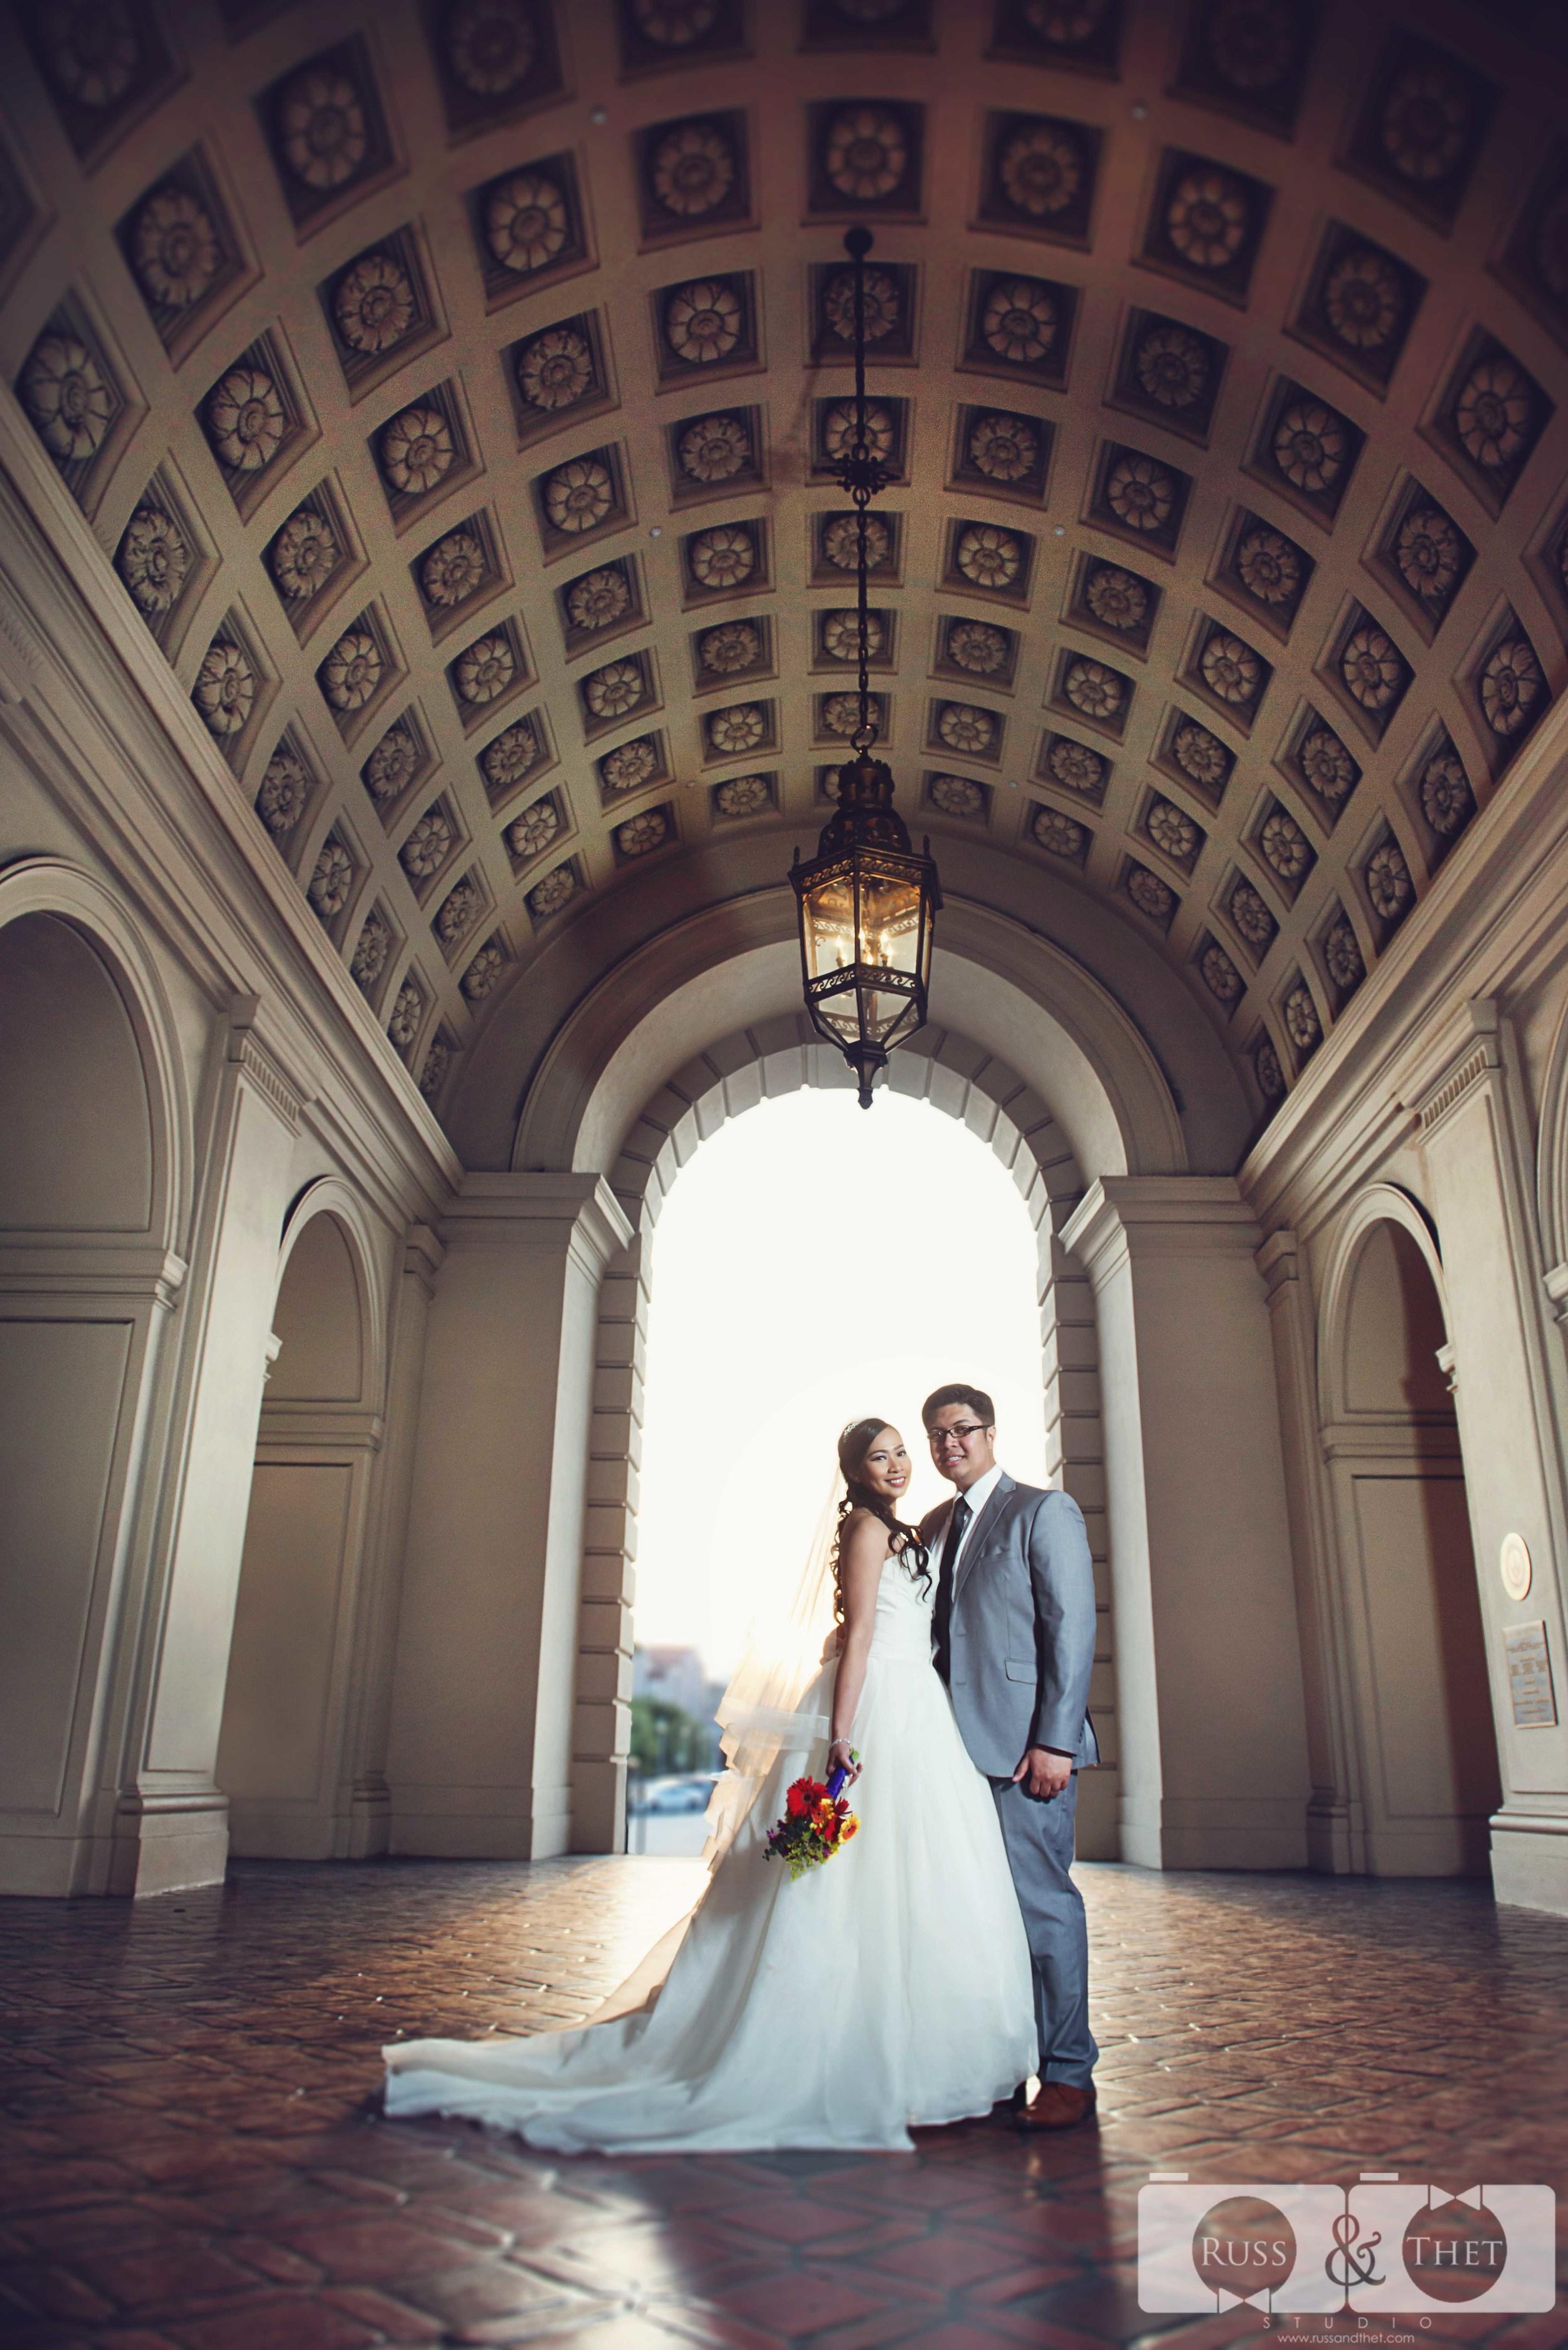 royal-palace-banquet-hall-glendale-wedding-81.JPG